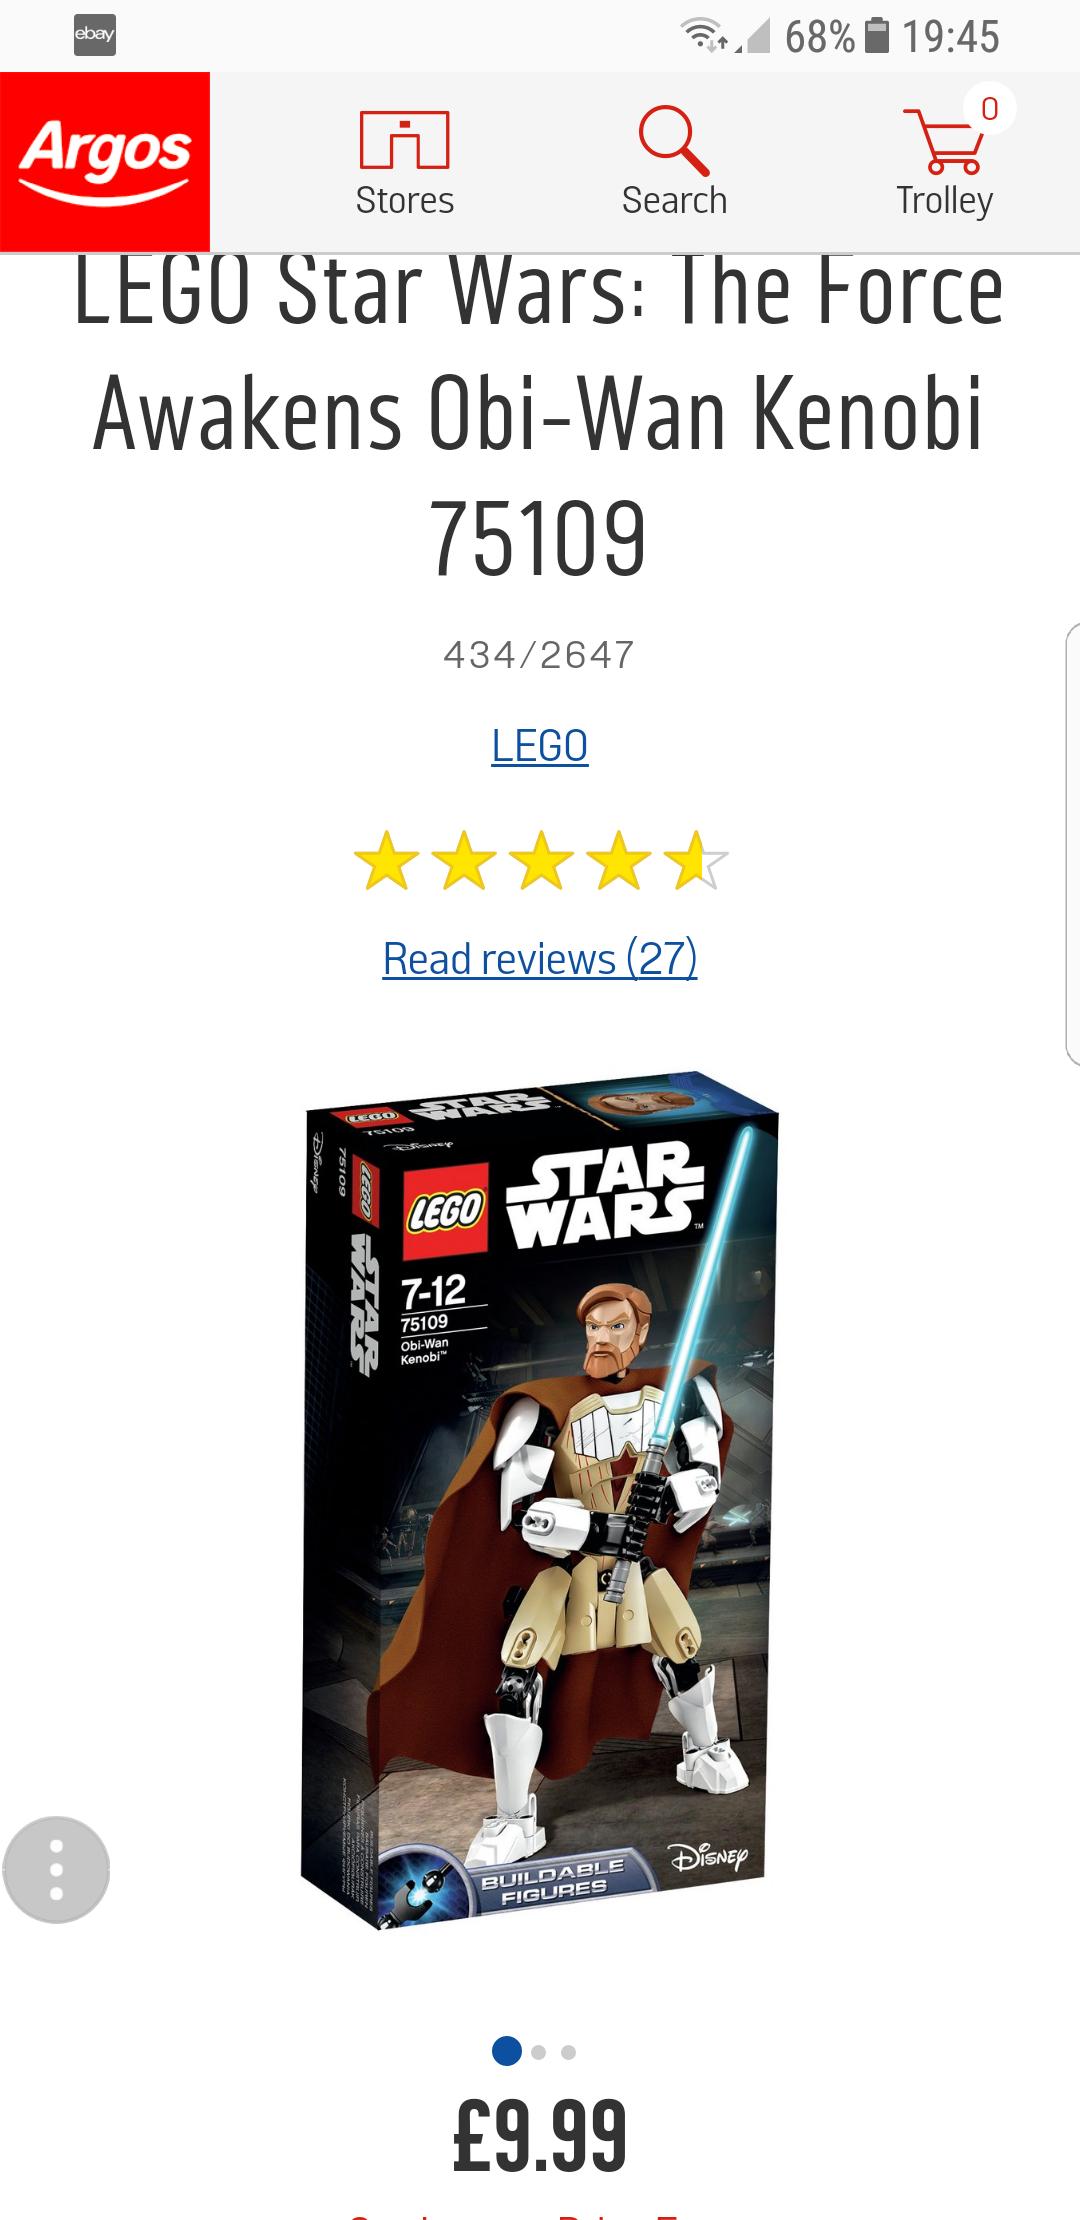 LEGO Star Wars: The Force Awakens Obi-Wan Kenobi £9.99 @ Argos